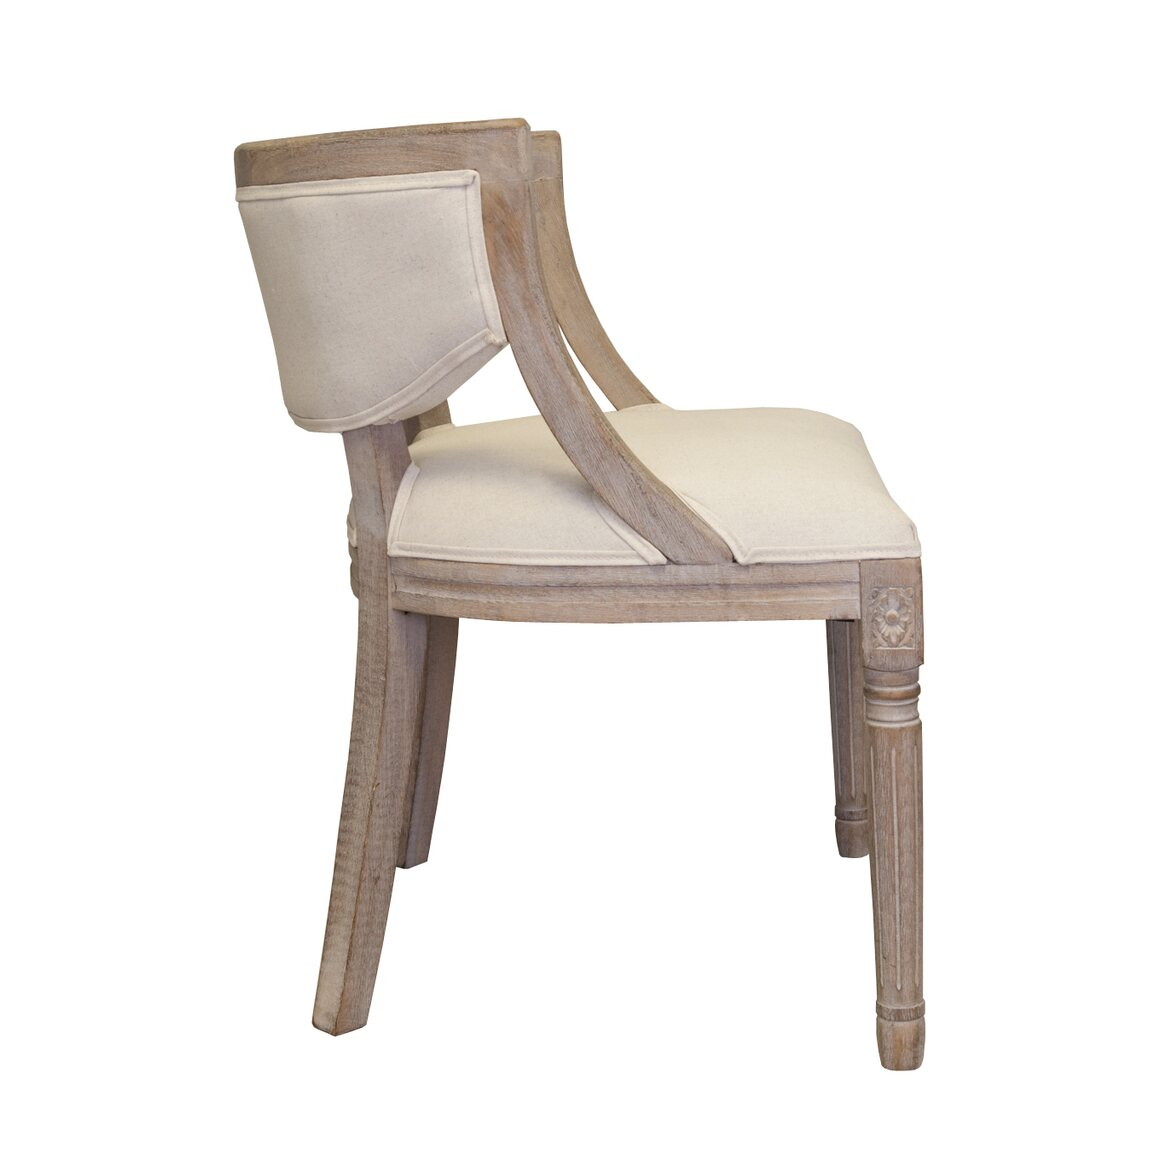 Стул Orzo 2 | Обеденные стулья Kingsby